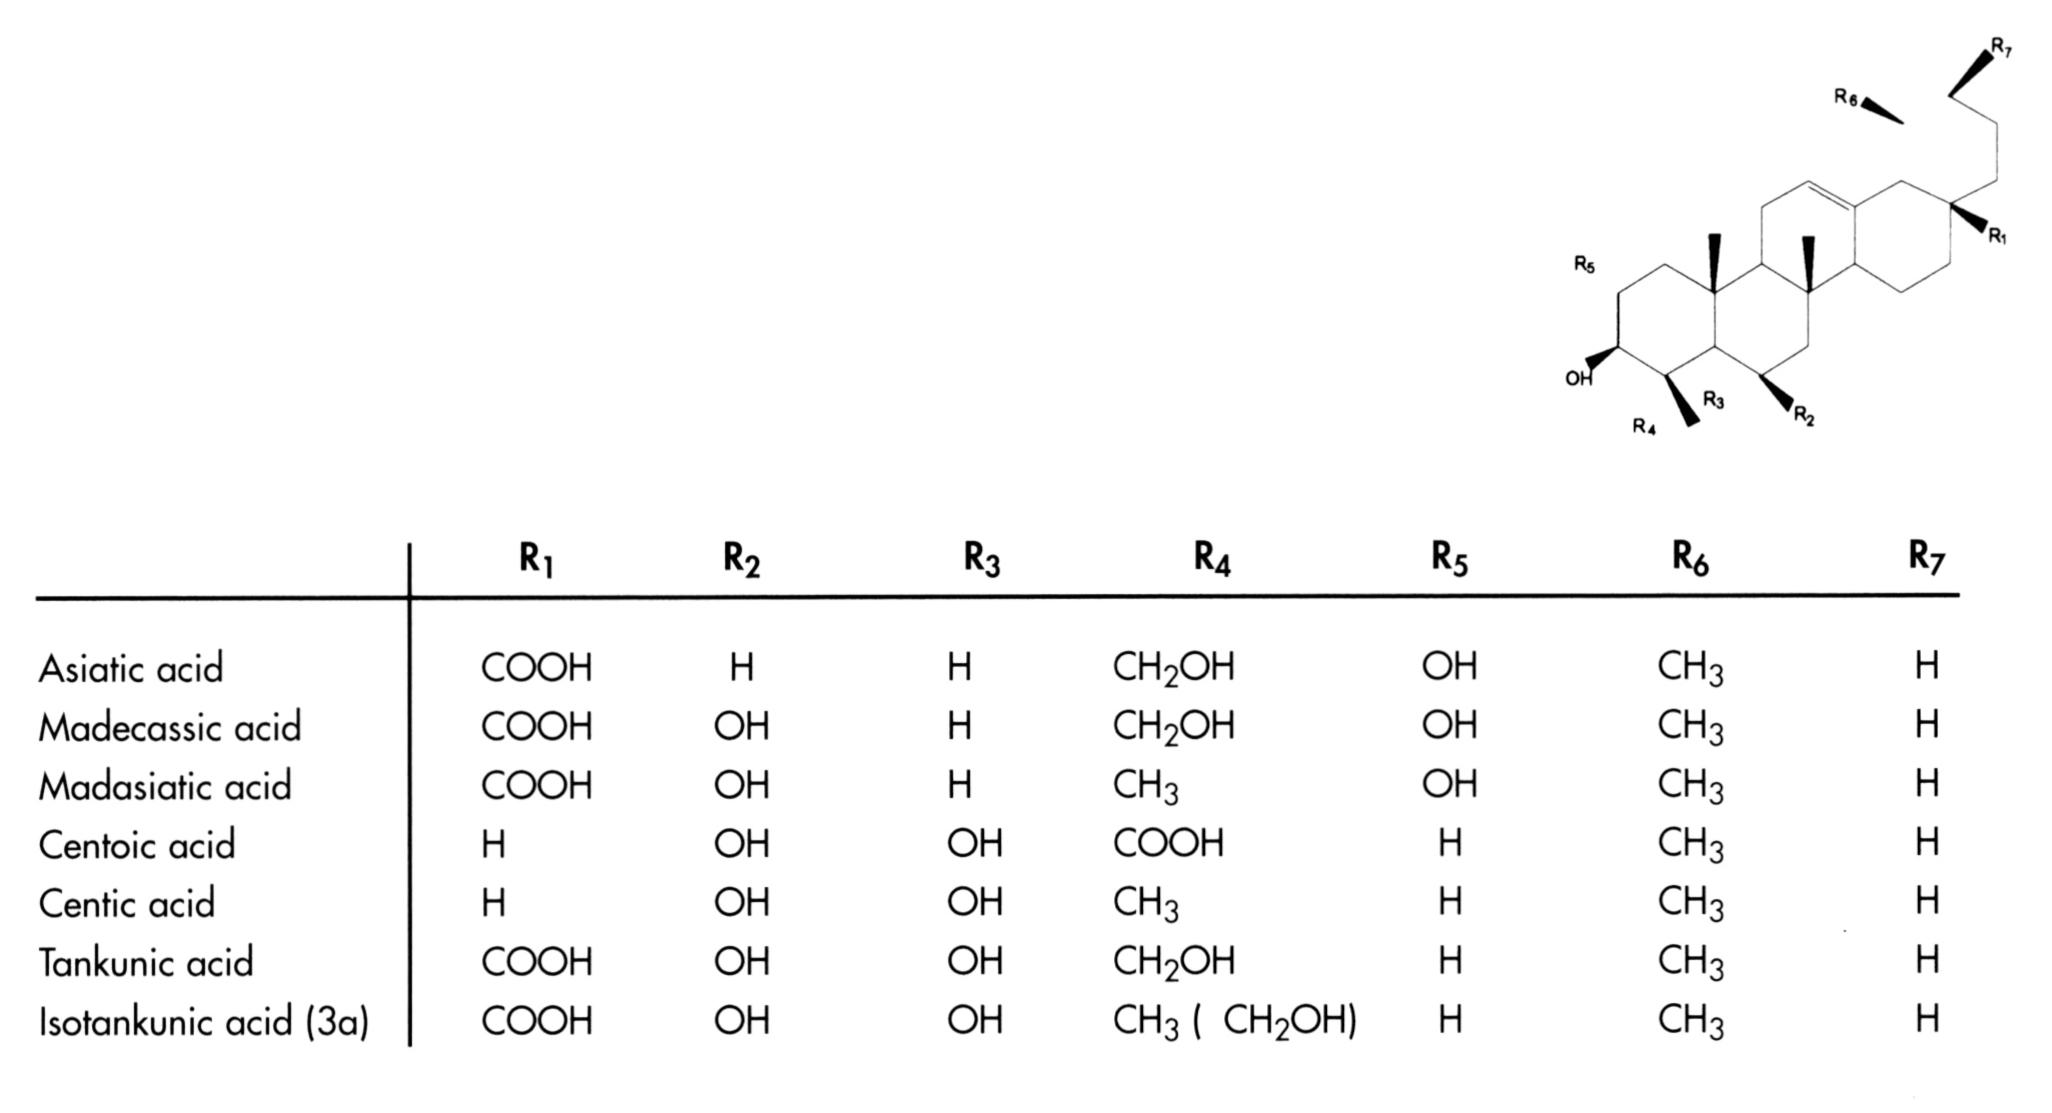 Arimidex - Steroids.org